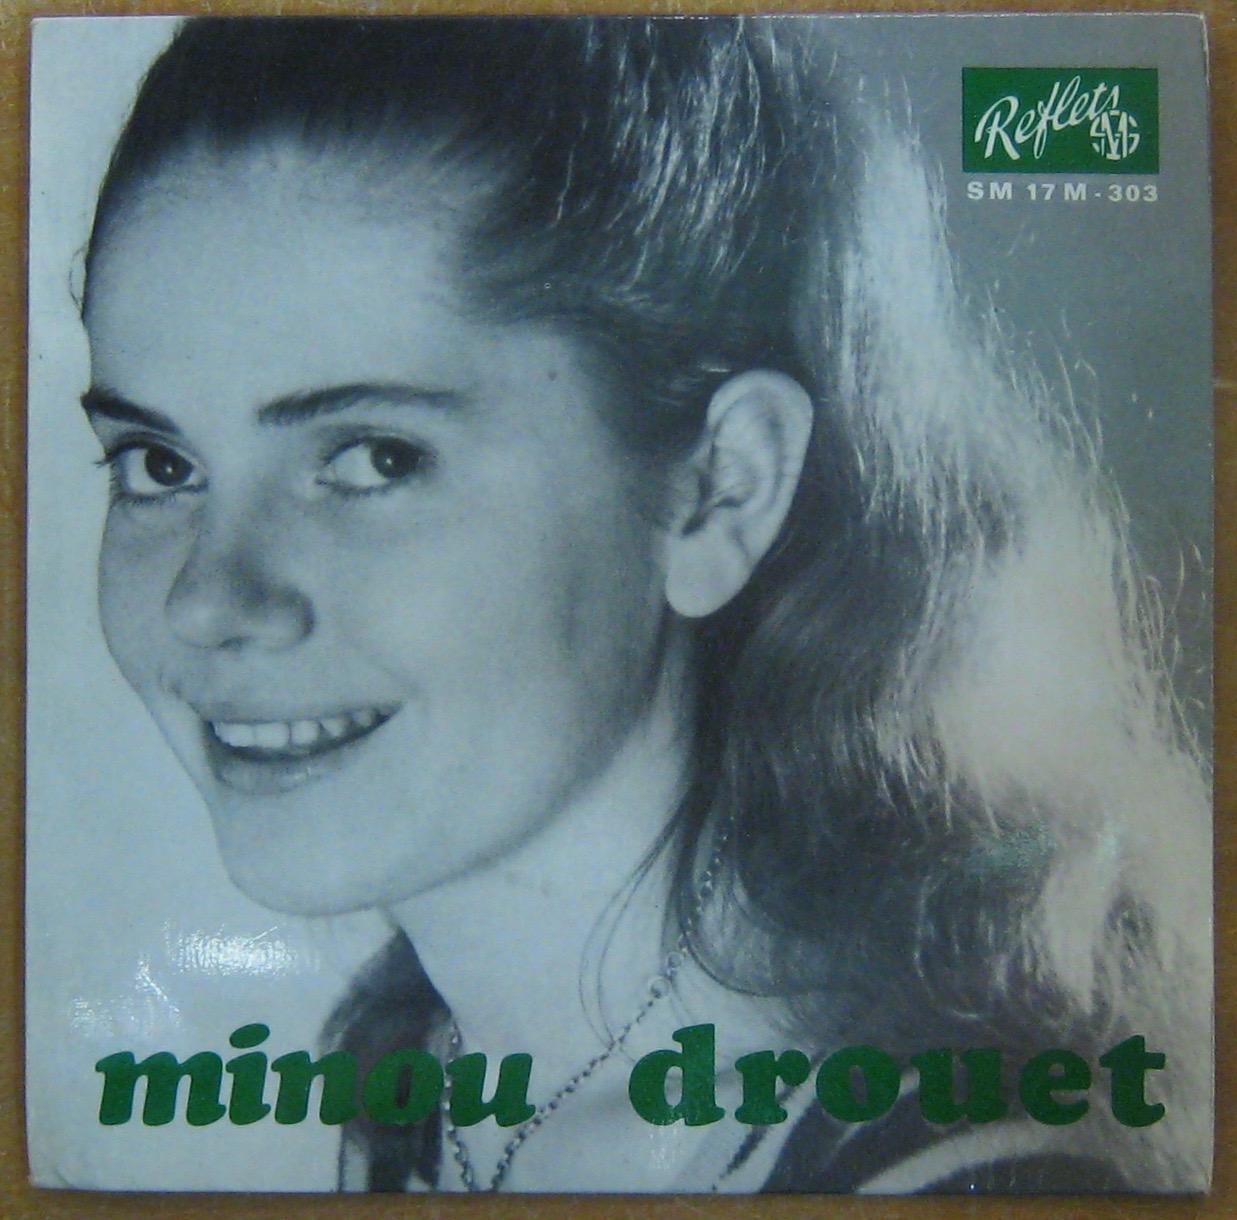 DROUET MINOU - Peccato - 45T (EP 4 titres)